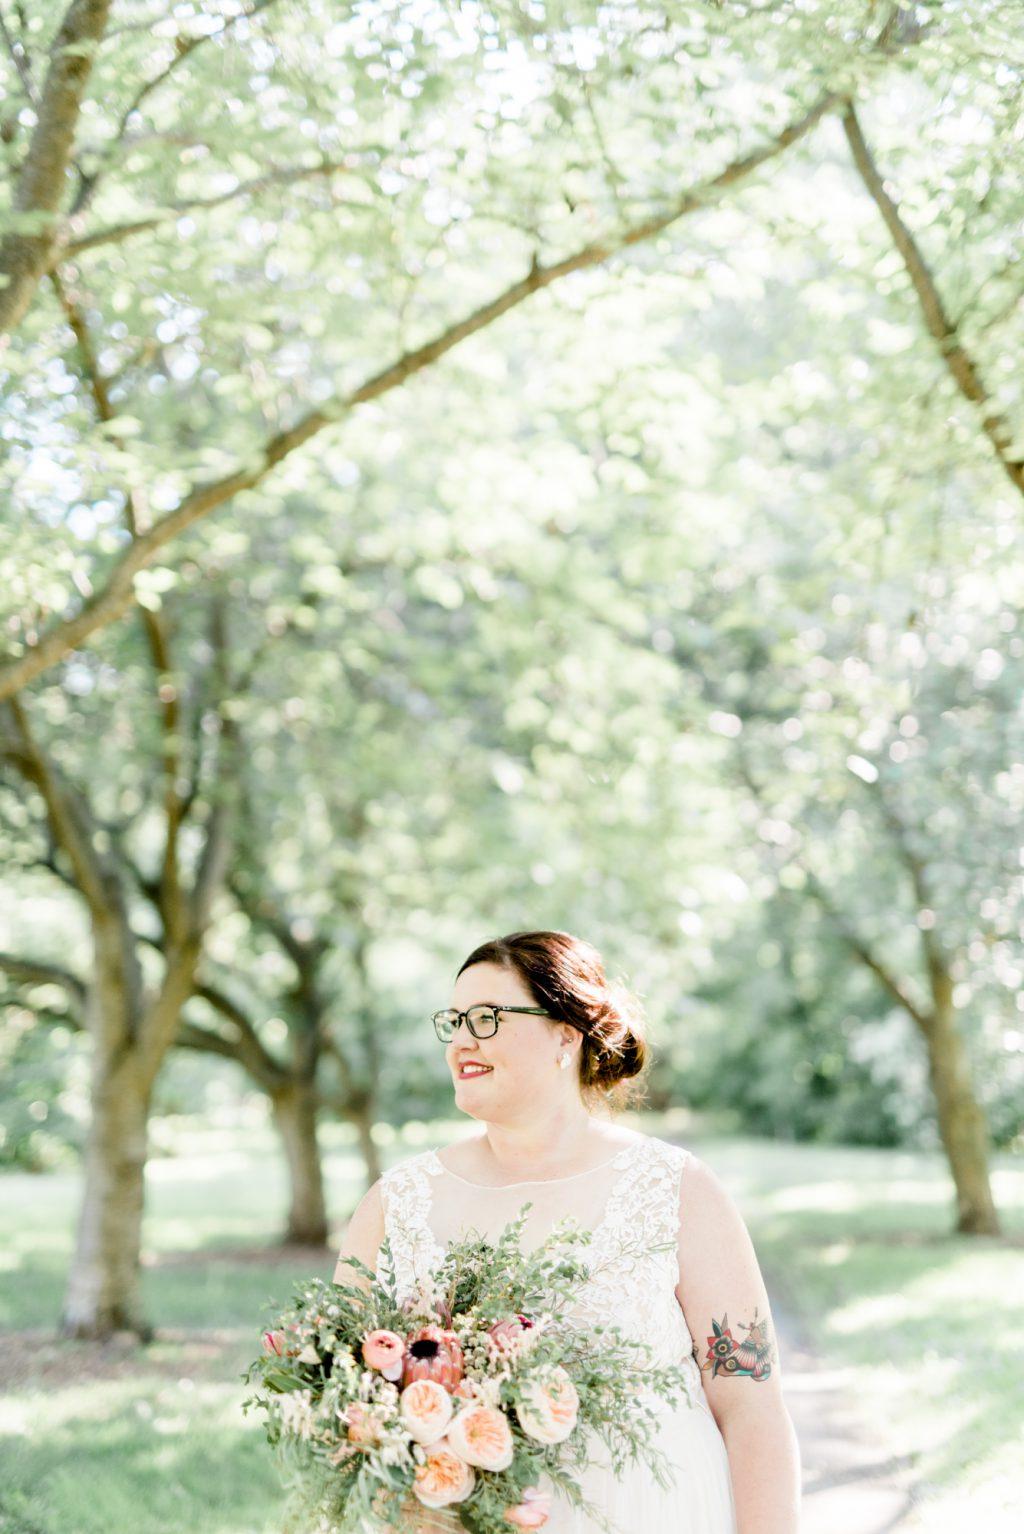 haley-richter-photo-west-chester-summer-wedding-boxcar-brewery-145